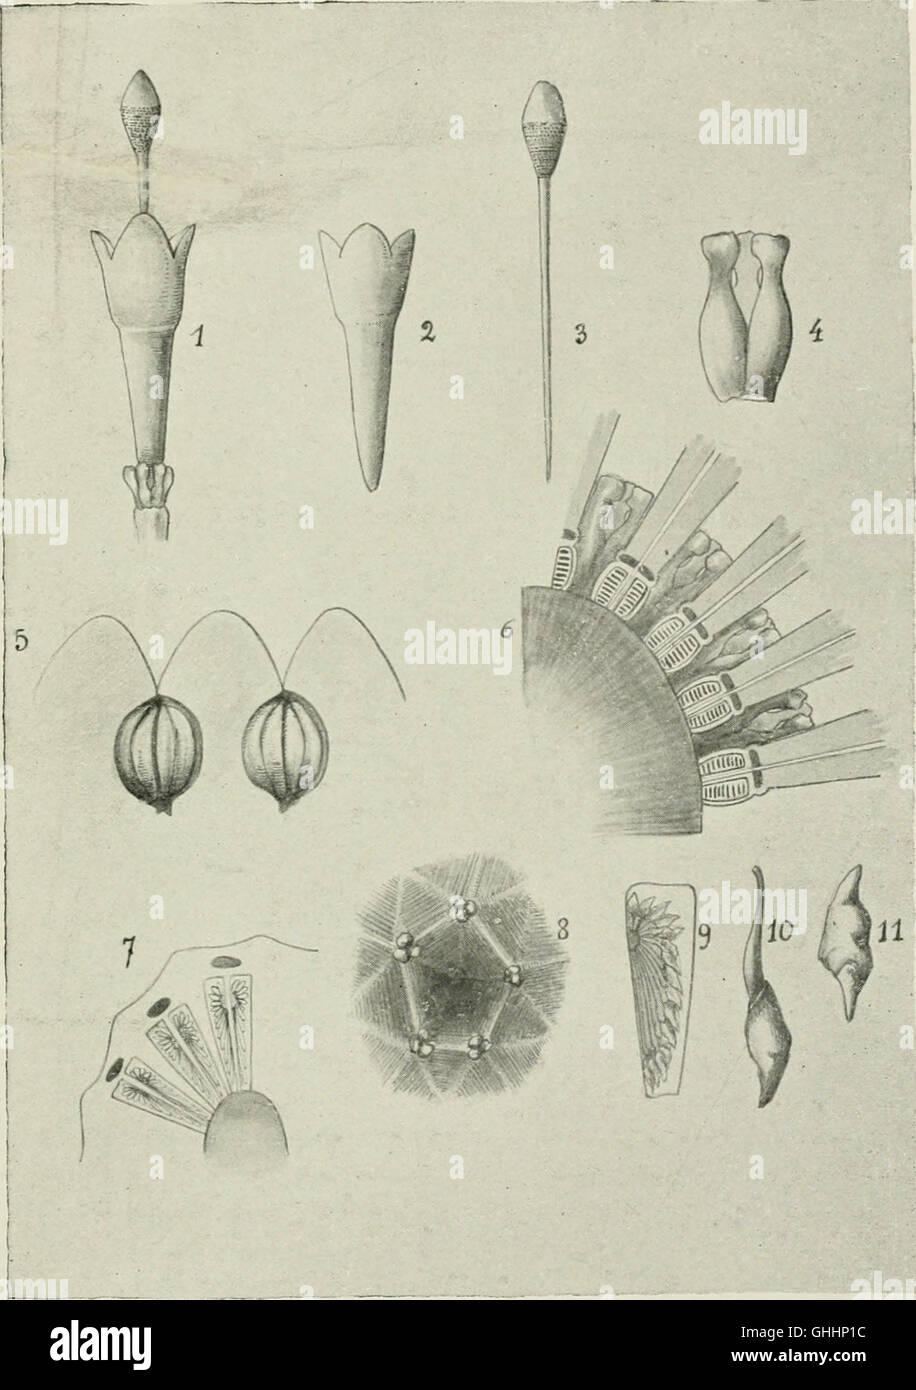 Bulletin du Musum national d'histoire naturelle ((1895-1970)) Stock Photo